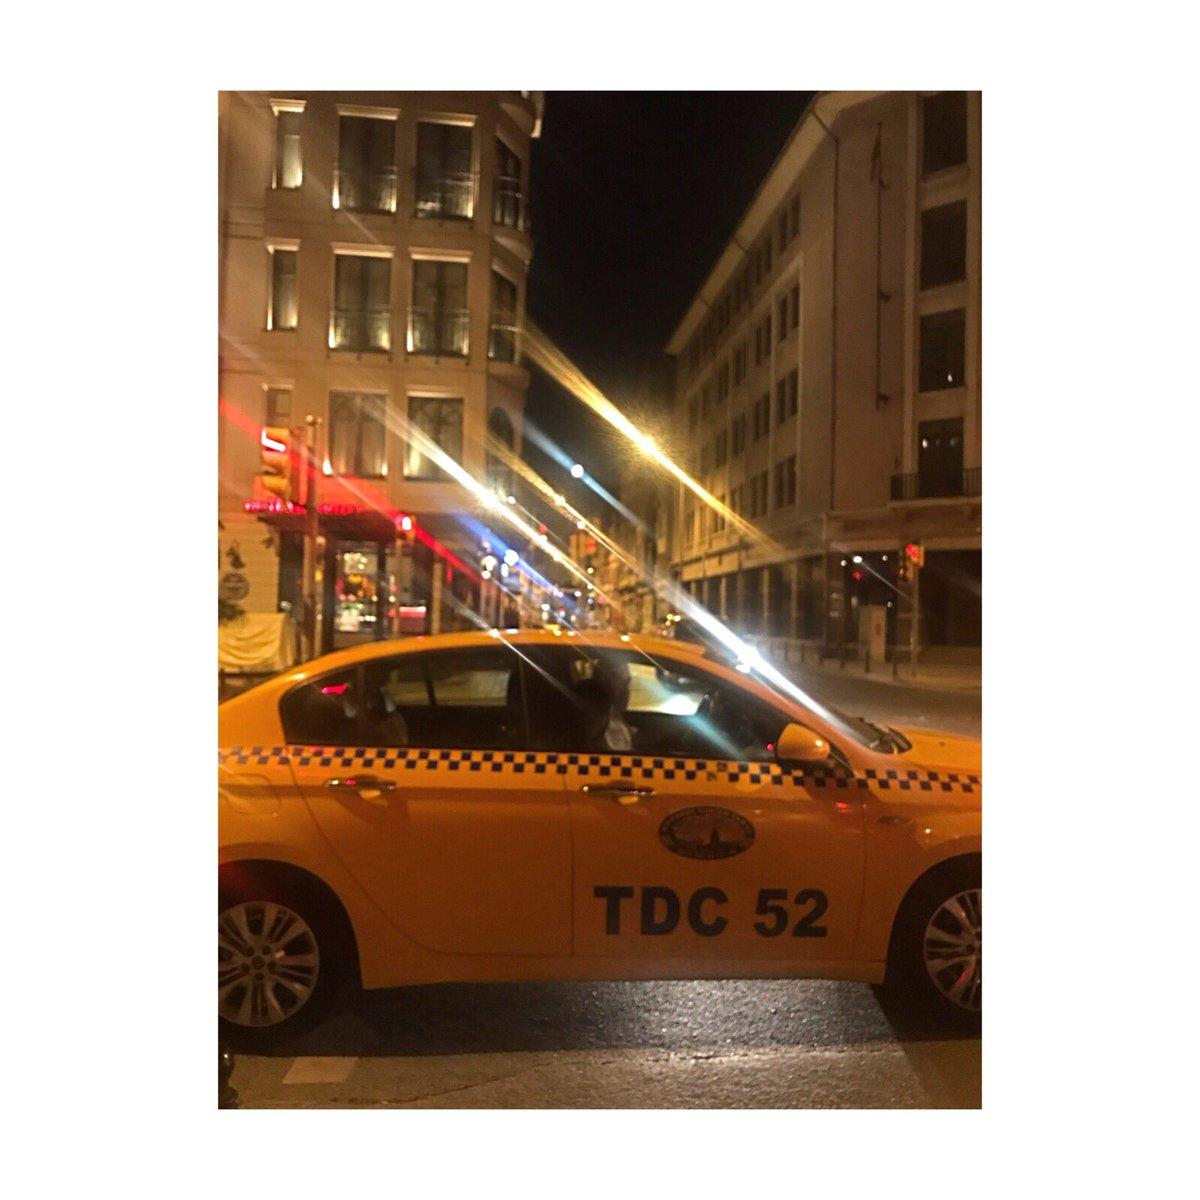 Istanbul City Vibes!!! . . . #visitistanbul #travel #city #citypic #taxi #estambul #lawyerfashion #fashionlawsummit #travellover #cityvibes #instatravel #antodicampo #antonelladicampo #antodicampotravel #vidaenequilibrio #lifeinbalancepic.twitter.com/lHz8TUDW8T – at The Haze Karaköy